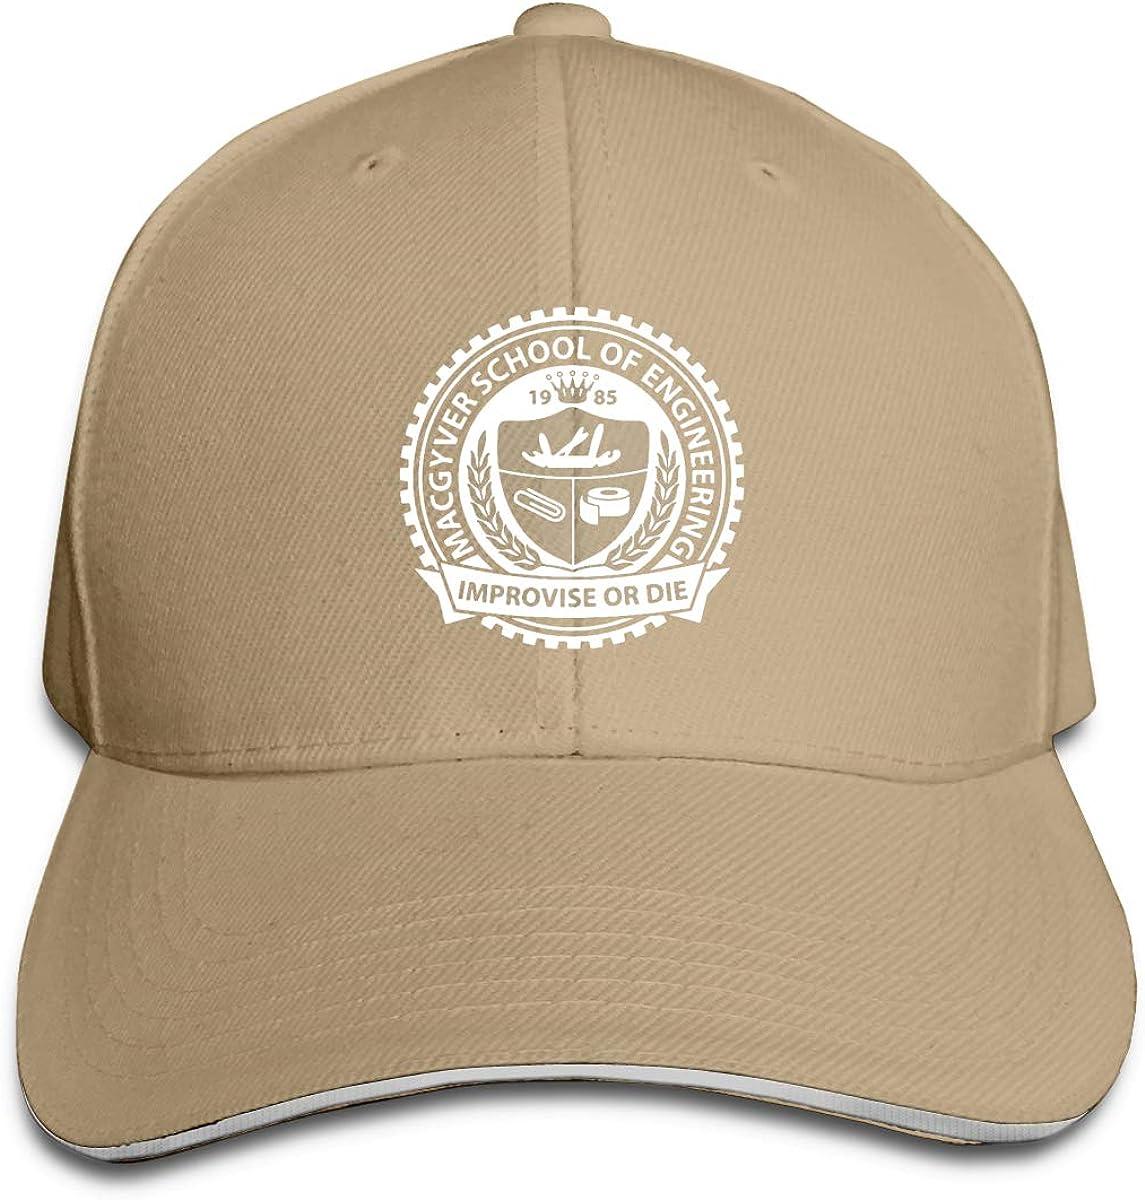 Eugrandet Macgyver School of Engineering Improvise Or Die Unisex Twill Adjustable Sports Hat